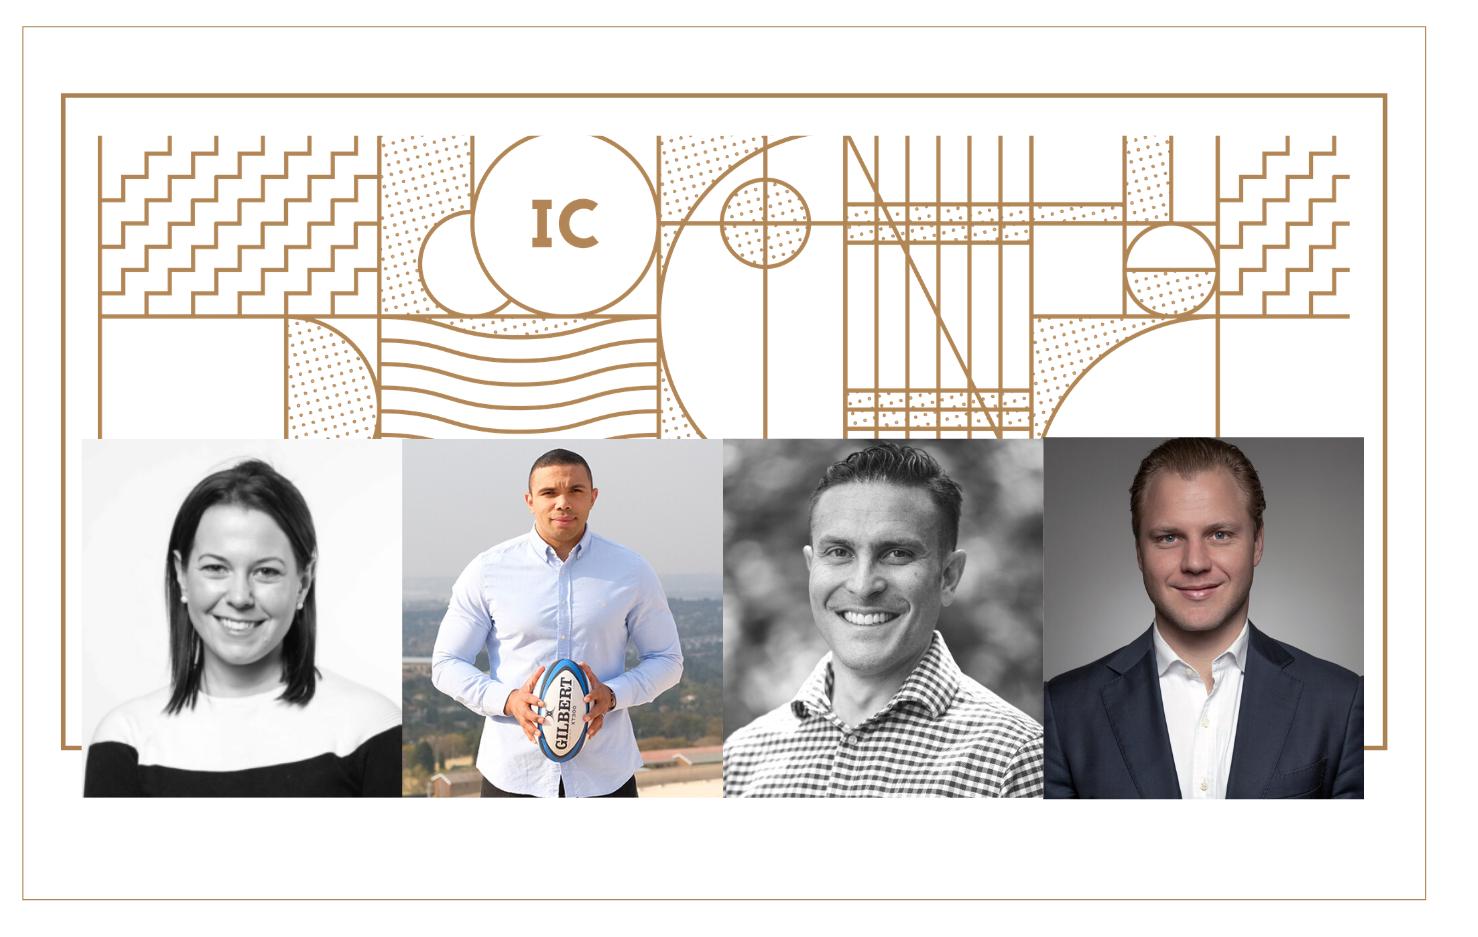 Facilitated Introductions - Introducing Jodi Neuhauser, Bryan Habana, Jedd Myers, and Edward Lepine Williams